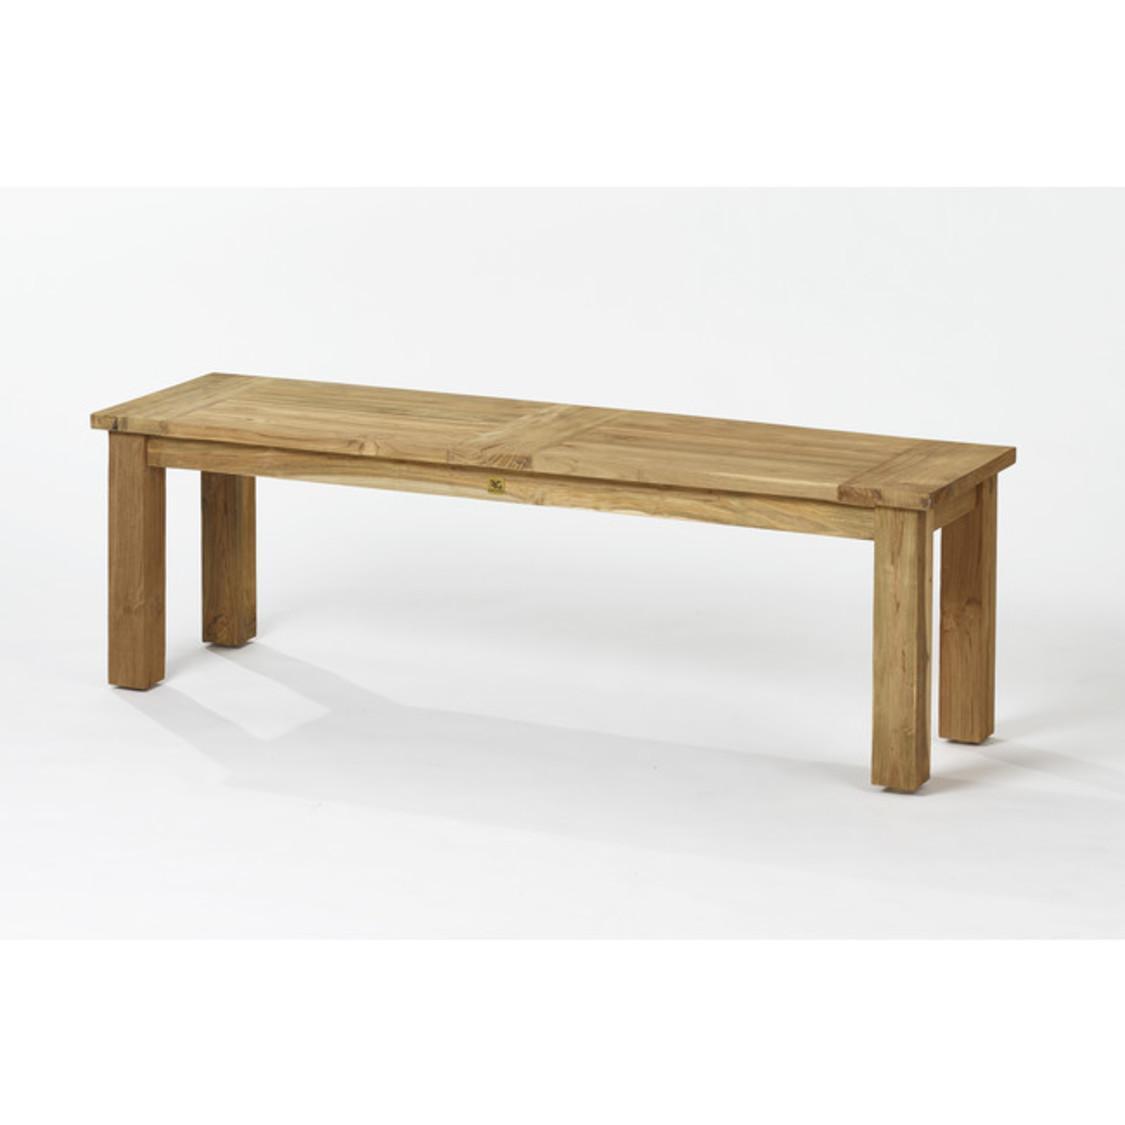 Sitzbank Ohne Lehne Holz